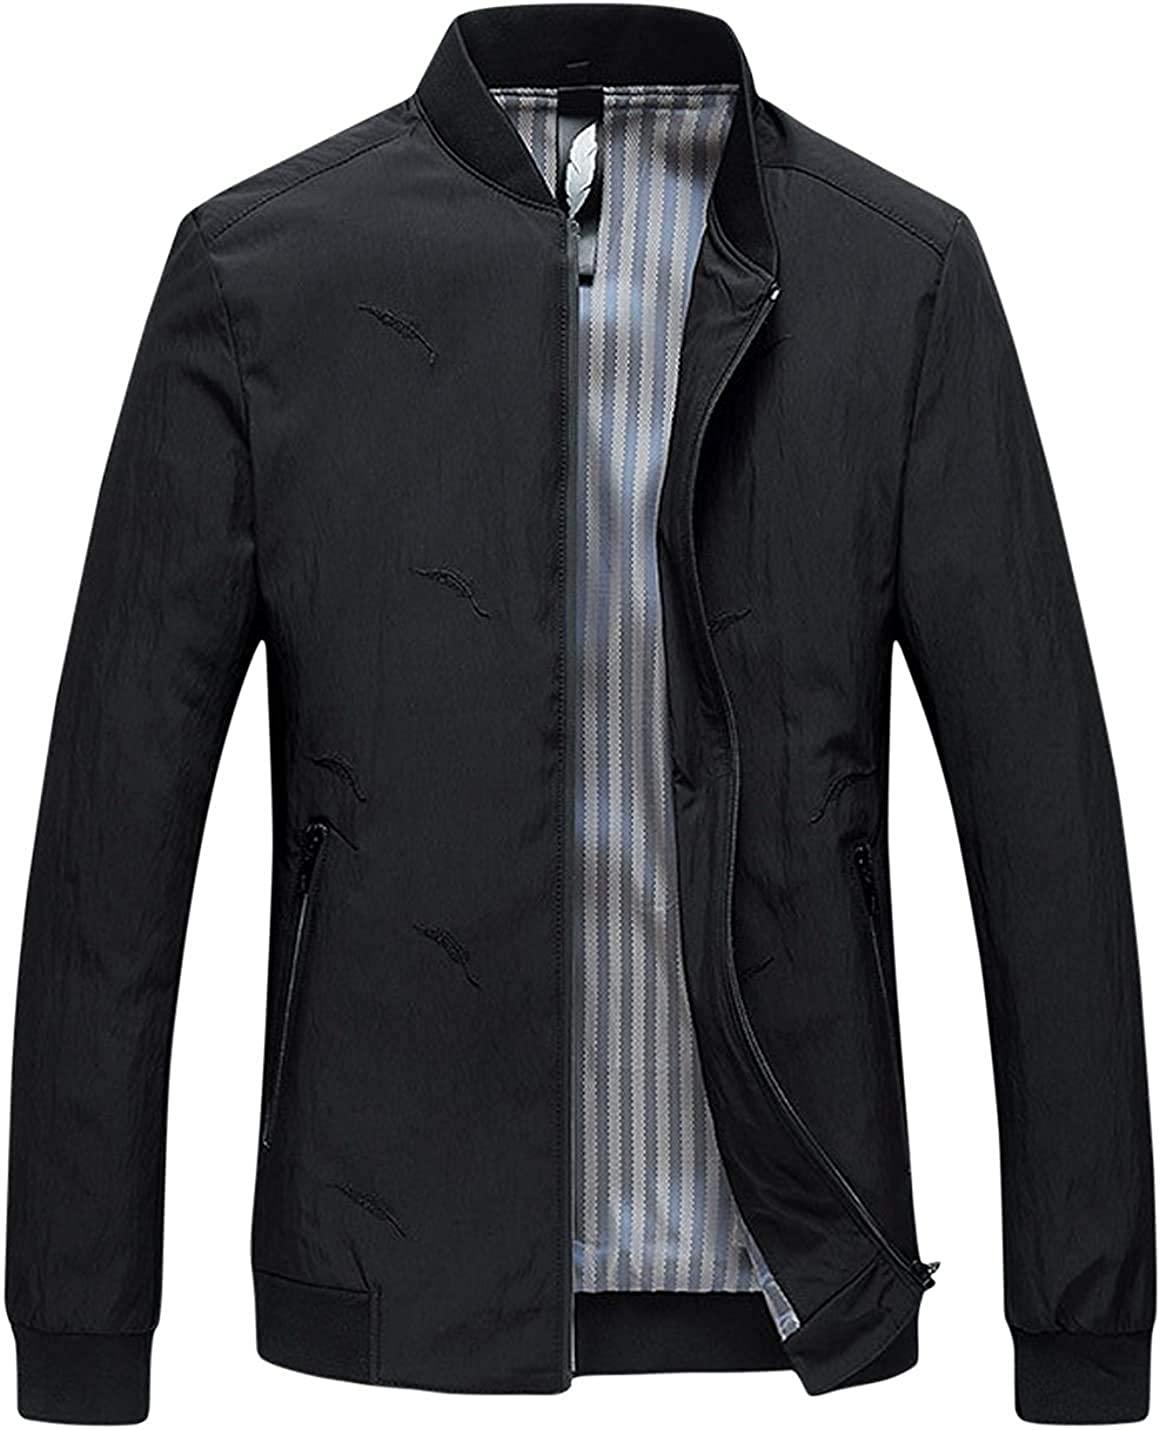 Gsdgjgg Men's Fashion Rib Collar Zipper Embroidered Outerwear Baseball Jackets